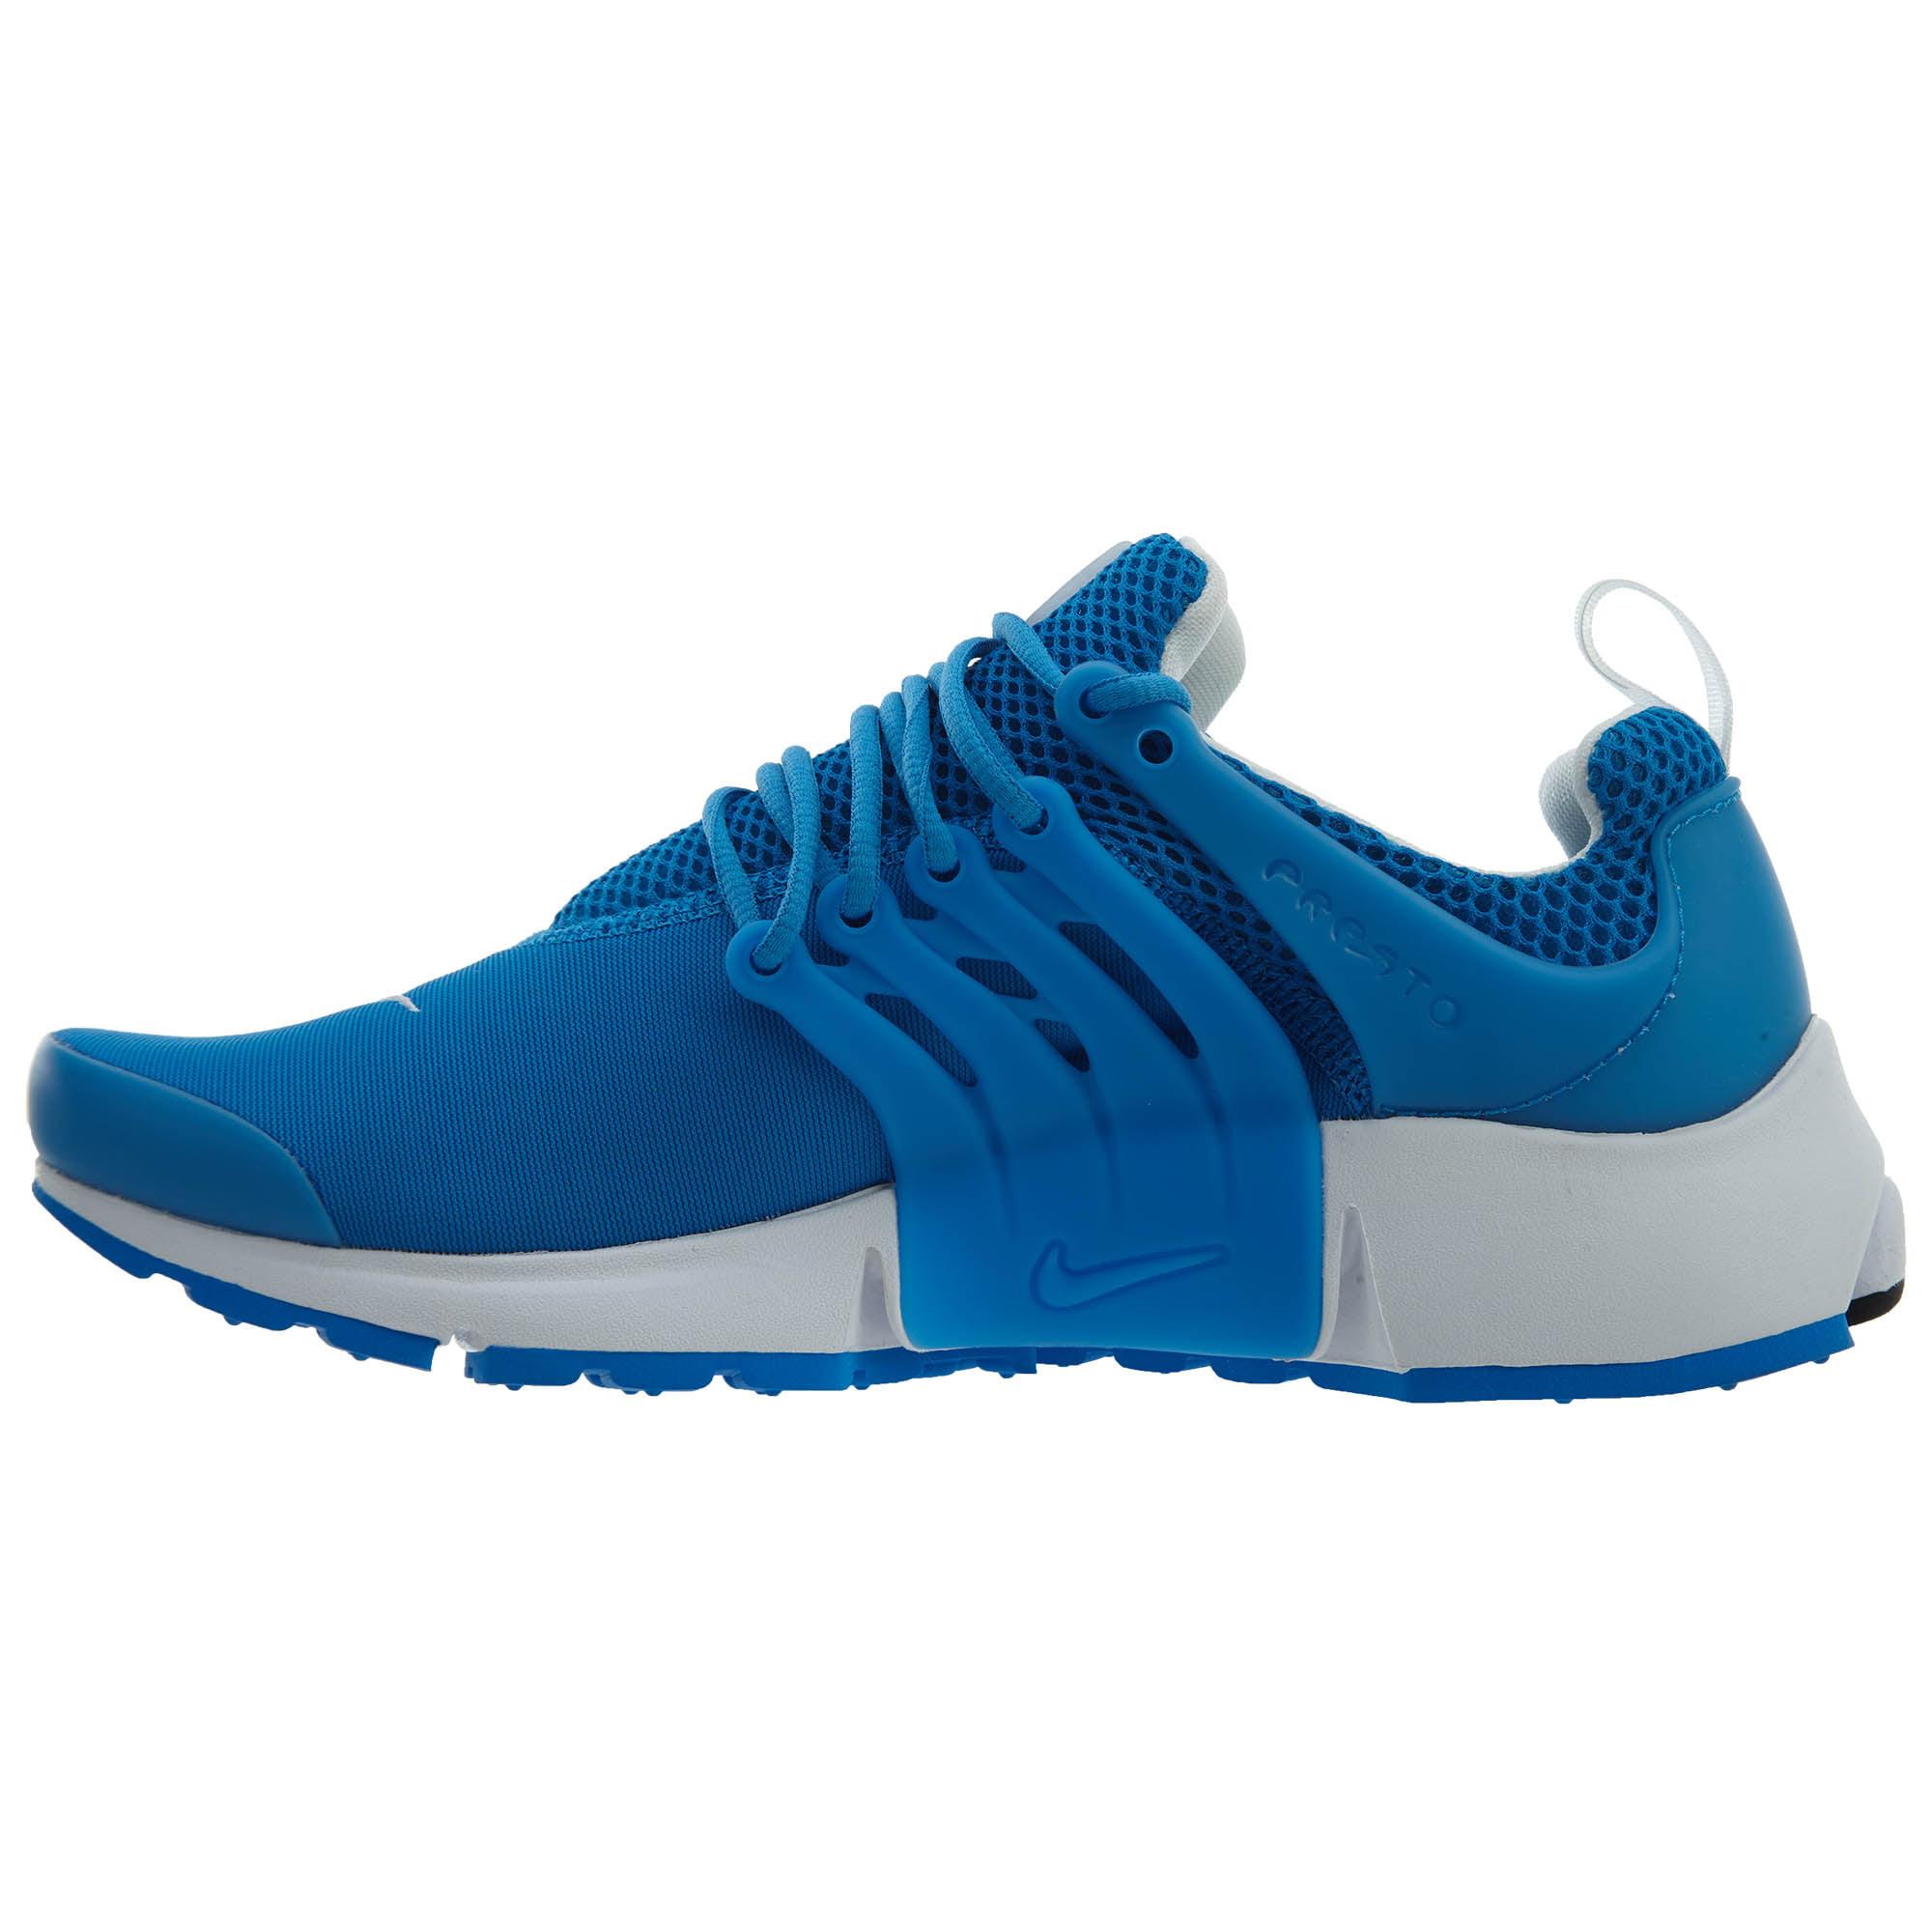 Nike Air Presto Essential Mens Style : 848187